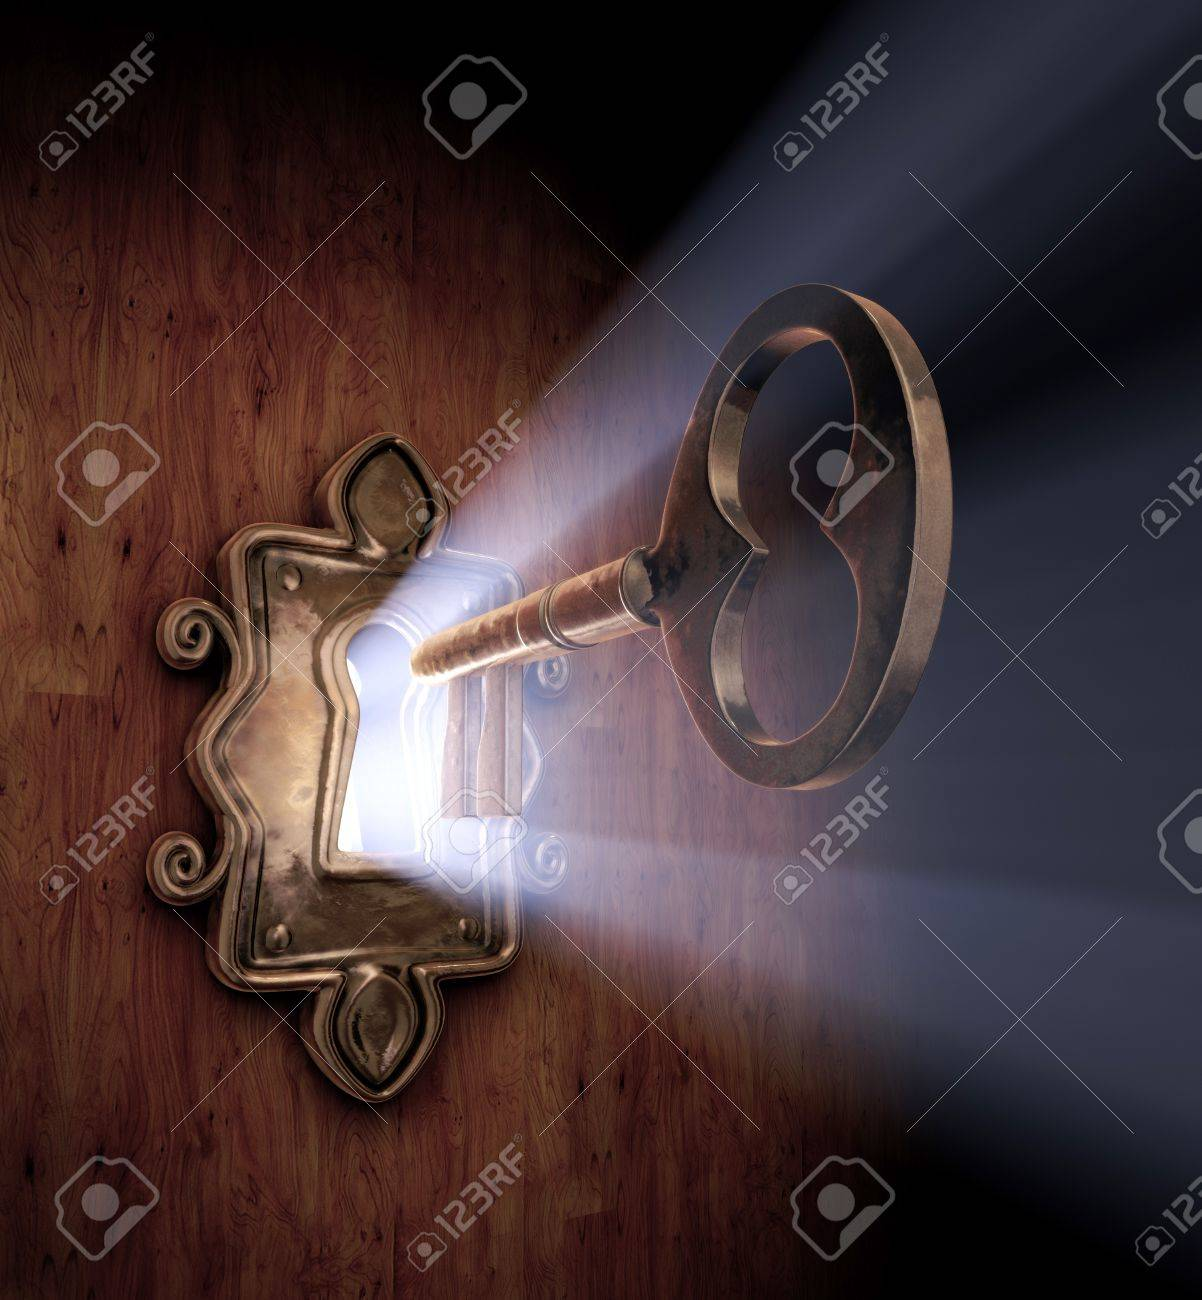 A close-up of a key moving towards the key hole. - 7059069